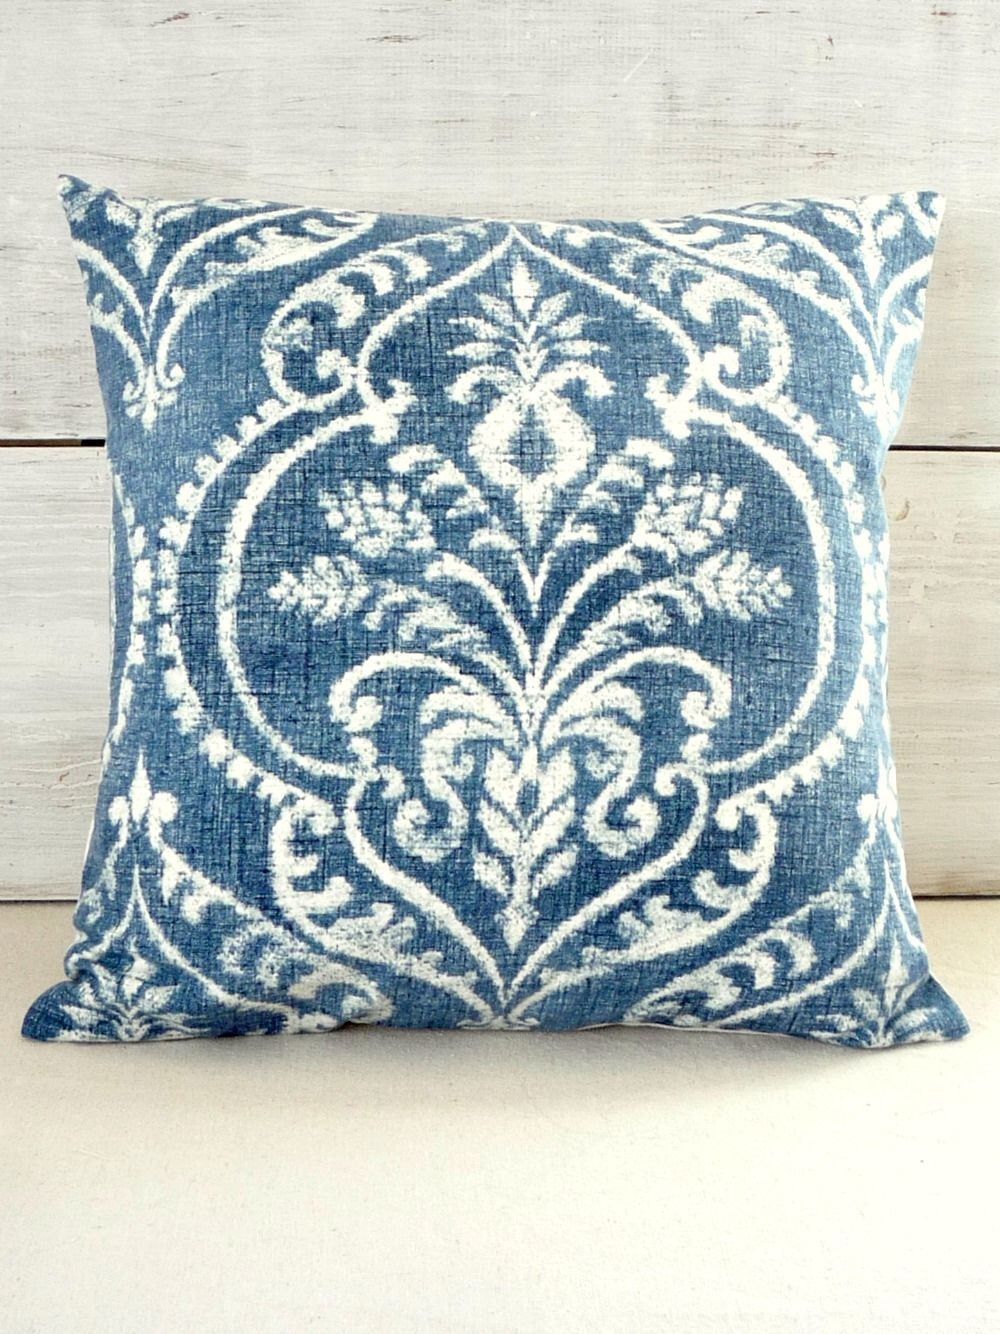 Denim blue damask pillow cover throw pillow for shabby